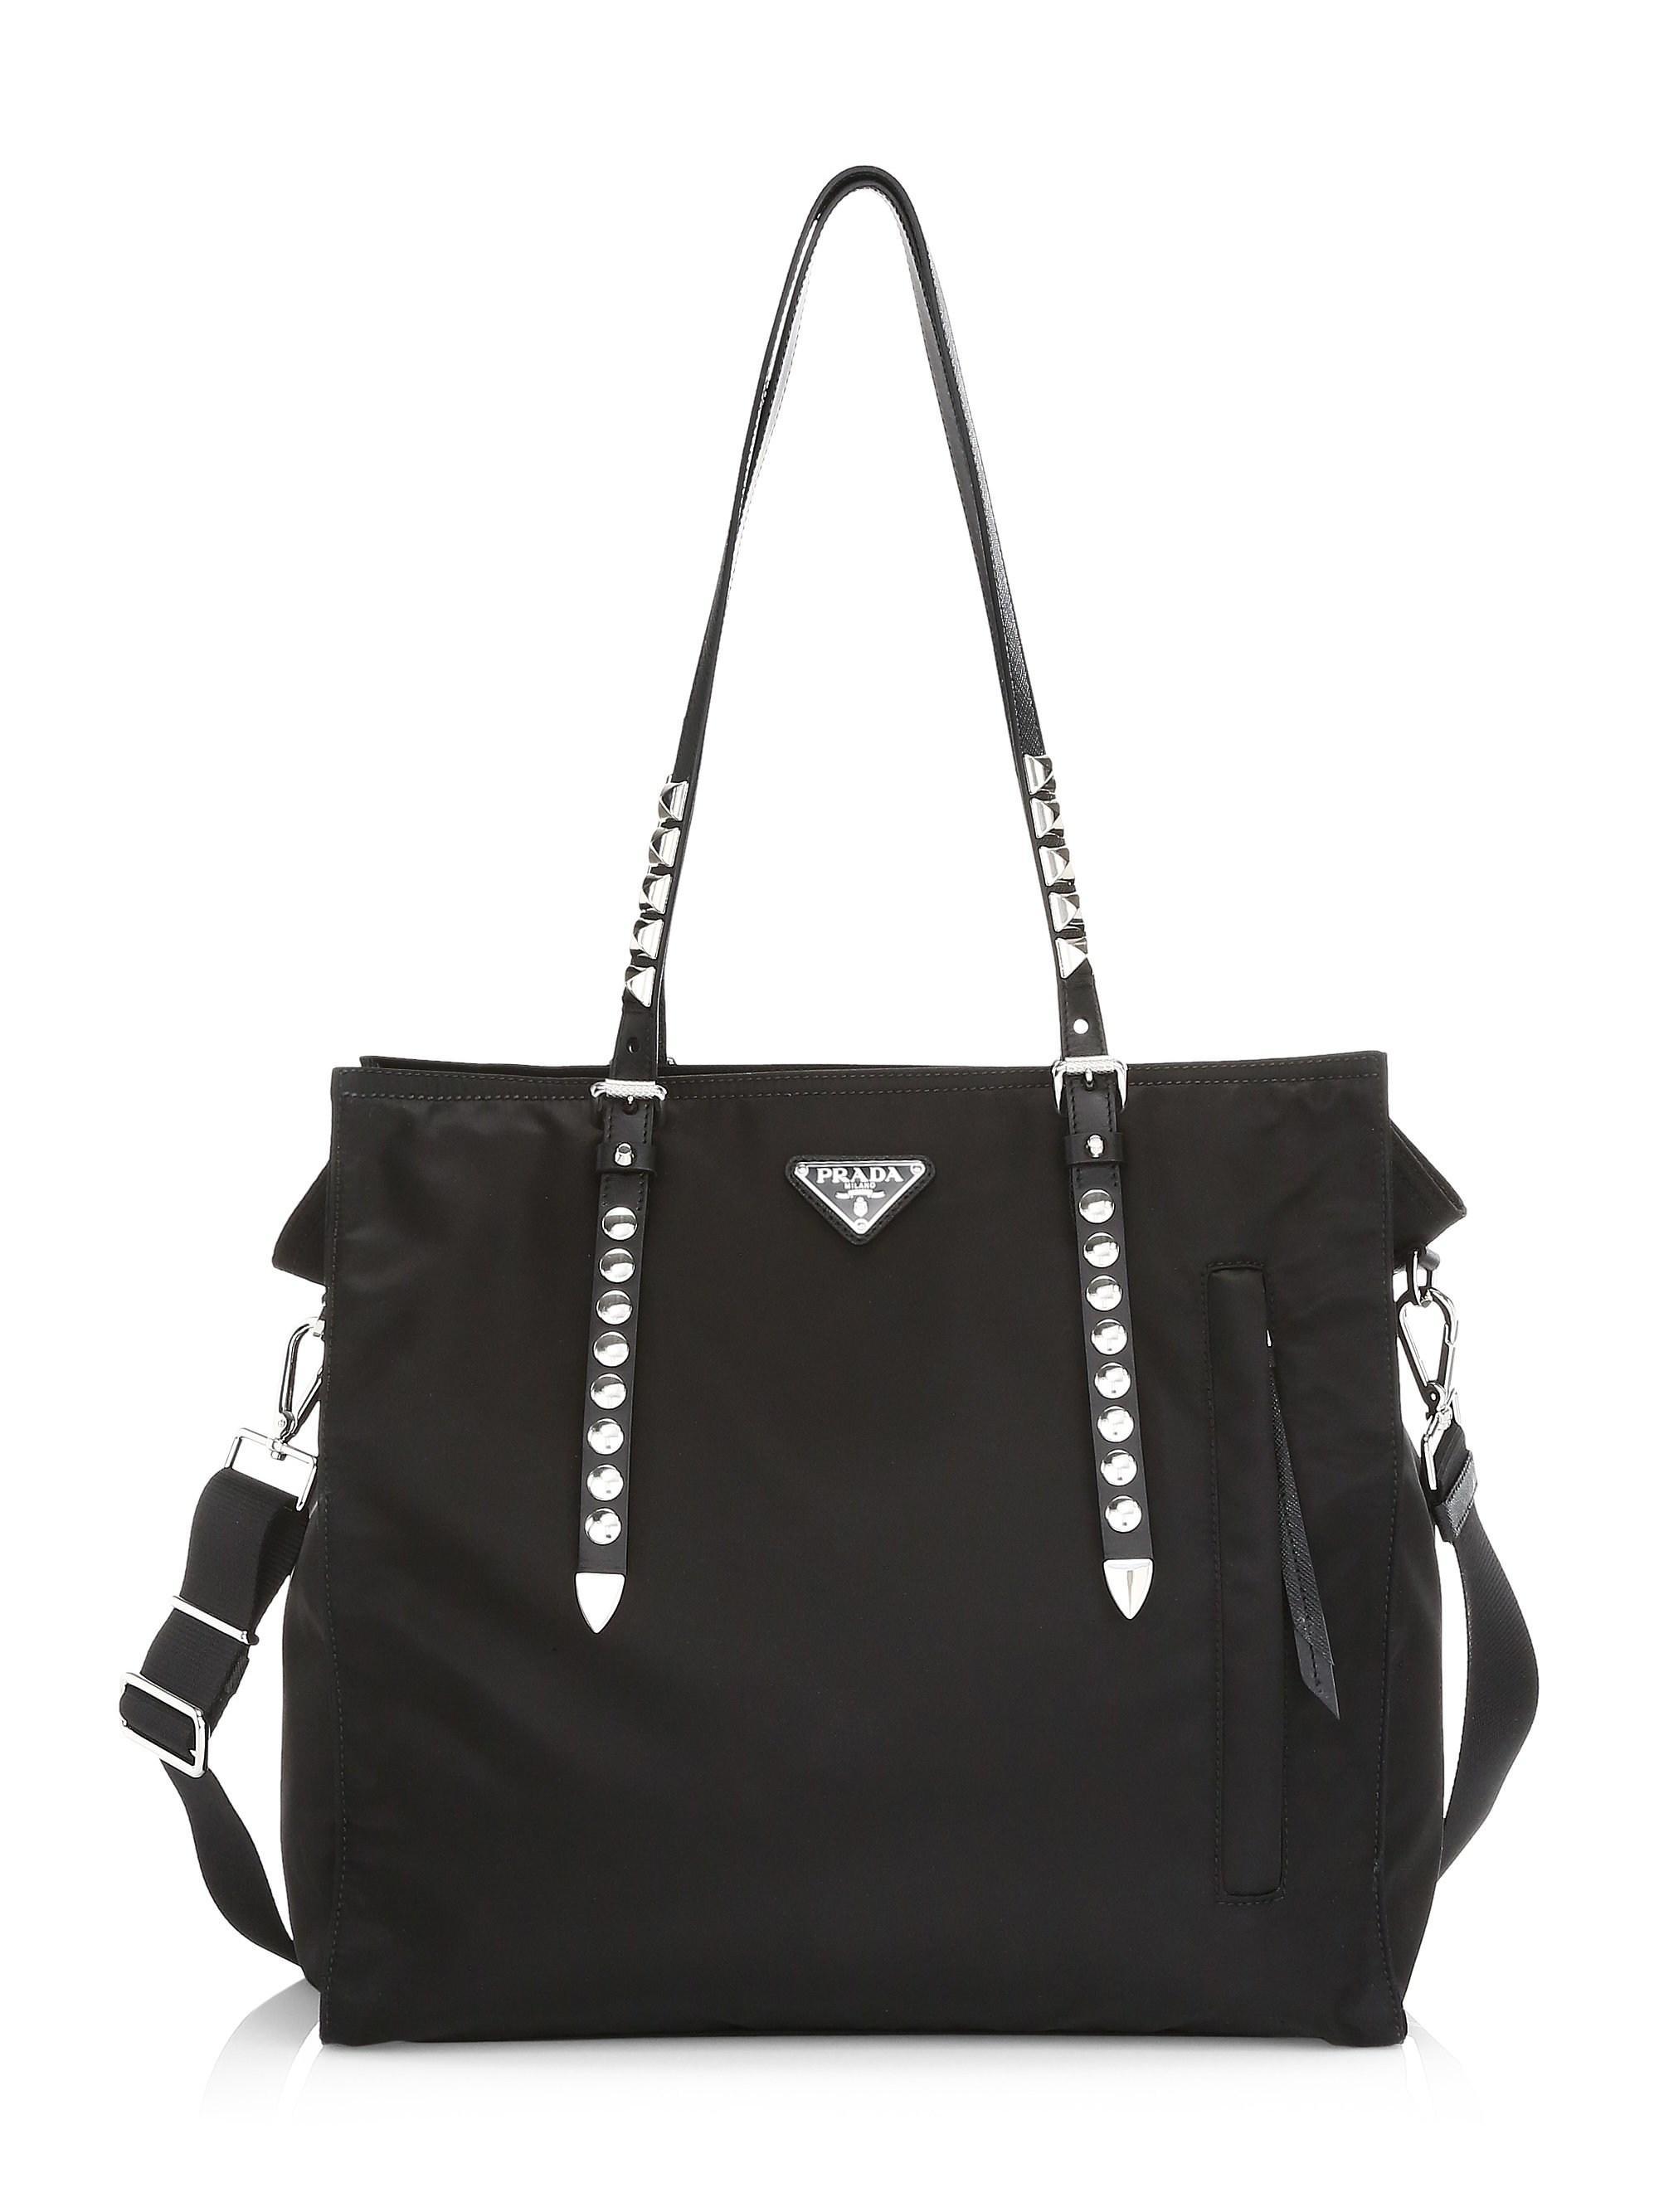 251bad1f3702 Prada - Black Nylon Shopper With Studding - Lyst. View fullscreen